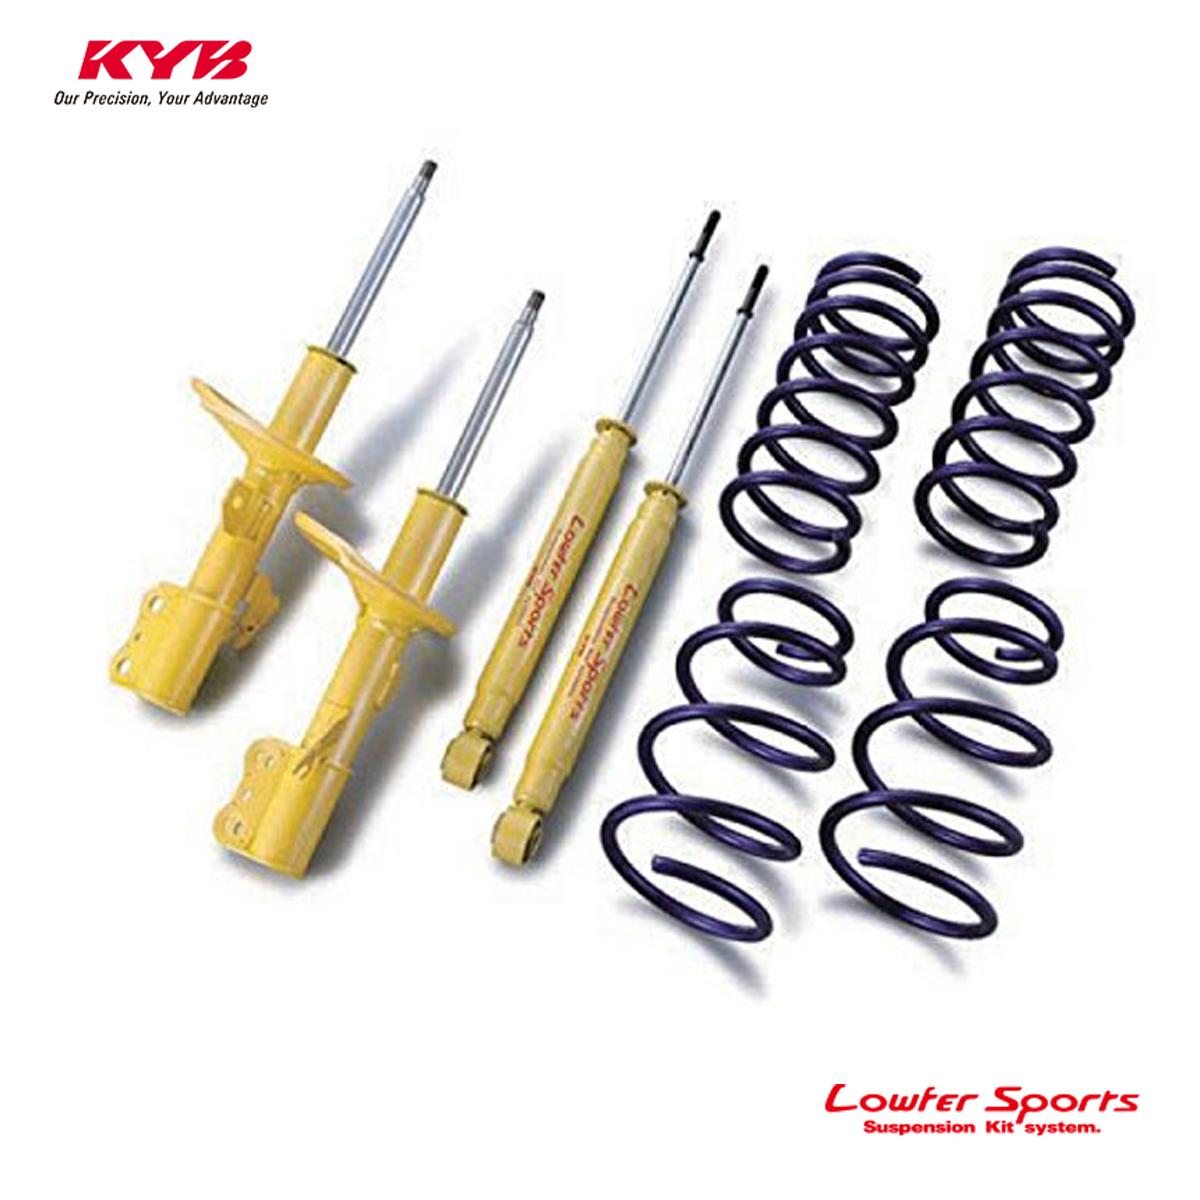 KYB カヤバ ワゴンR CV21S ショックアブソーバー サスペンションキット Lowfer Sports LKIT-CT21S 配送先条件有り